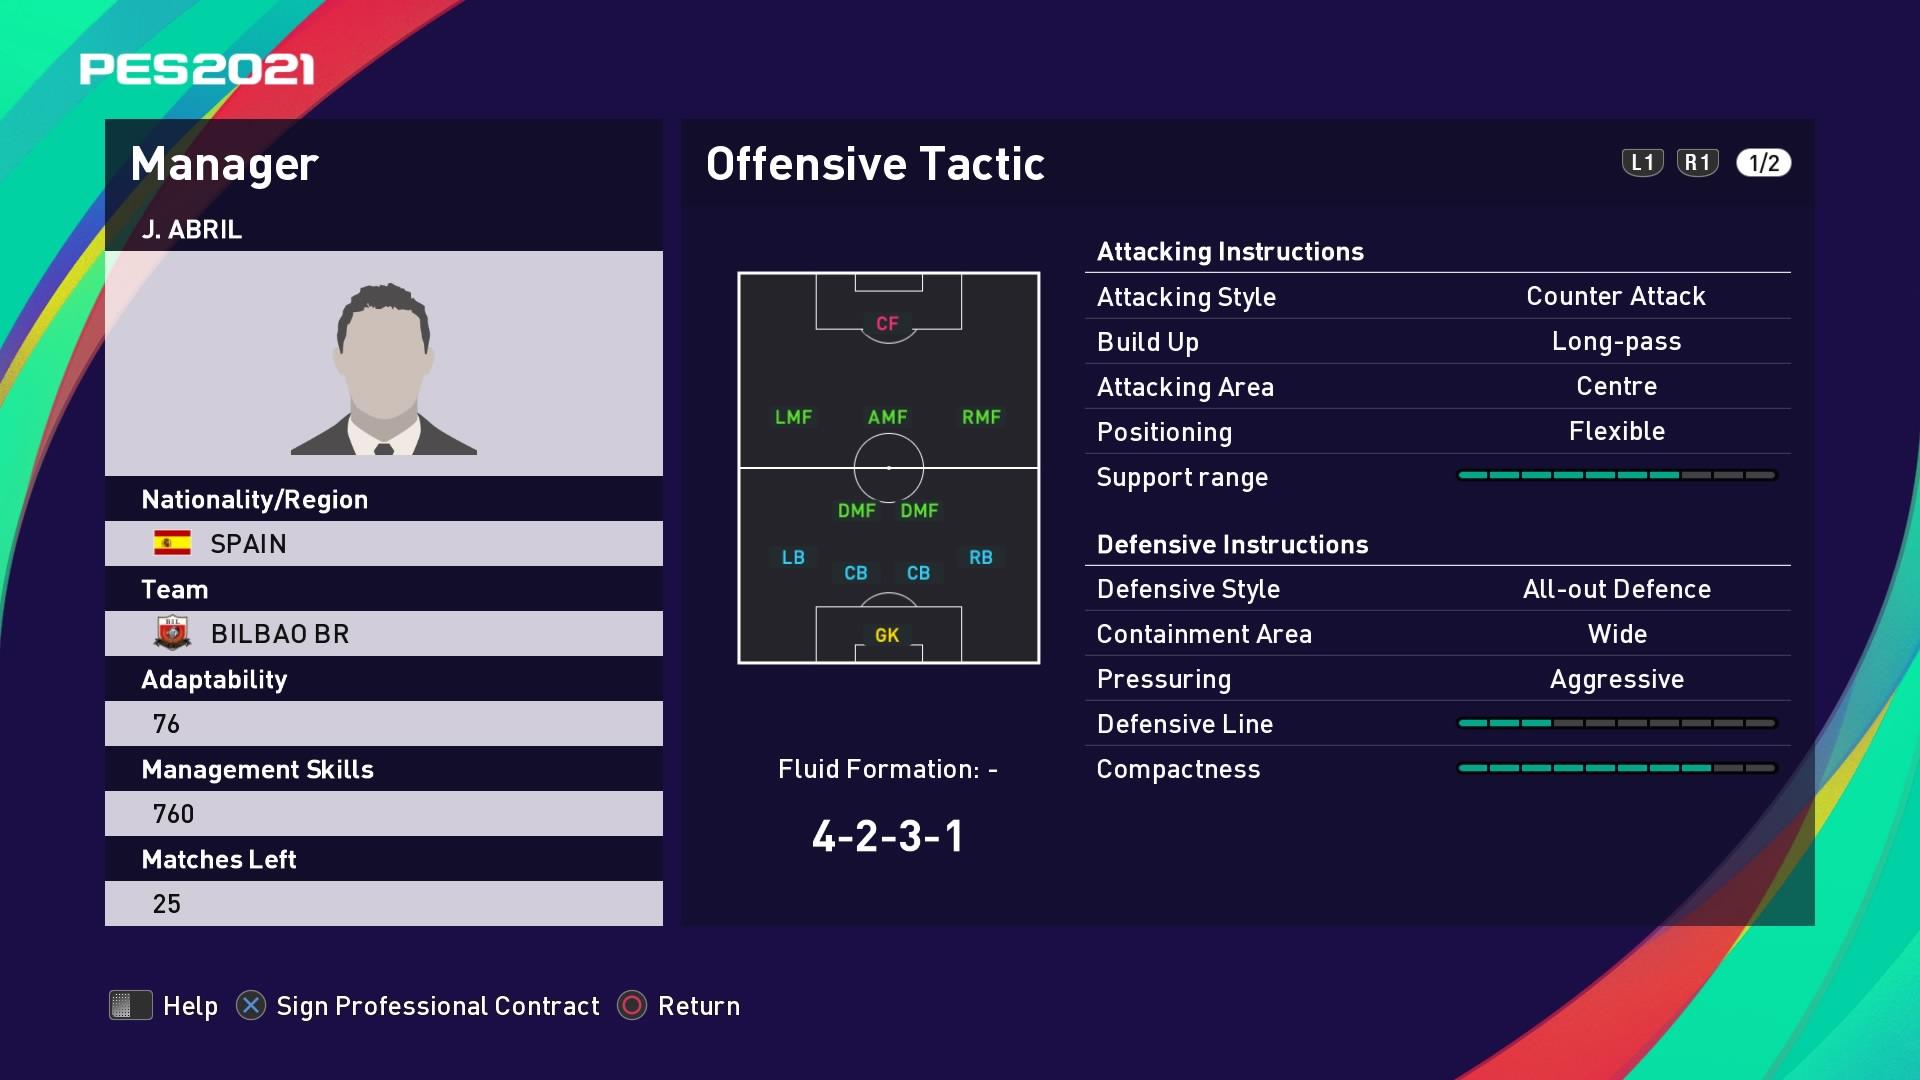 J. Abril (Gaizka Garitano) Offensive Tactic in PES 2021 myClub